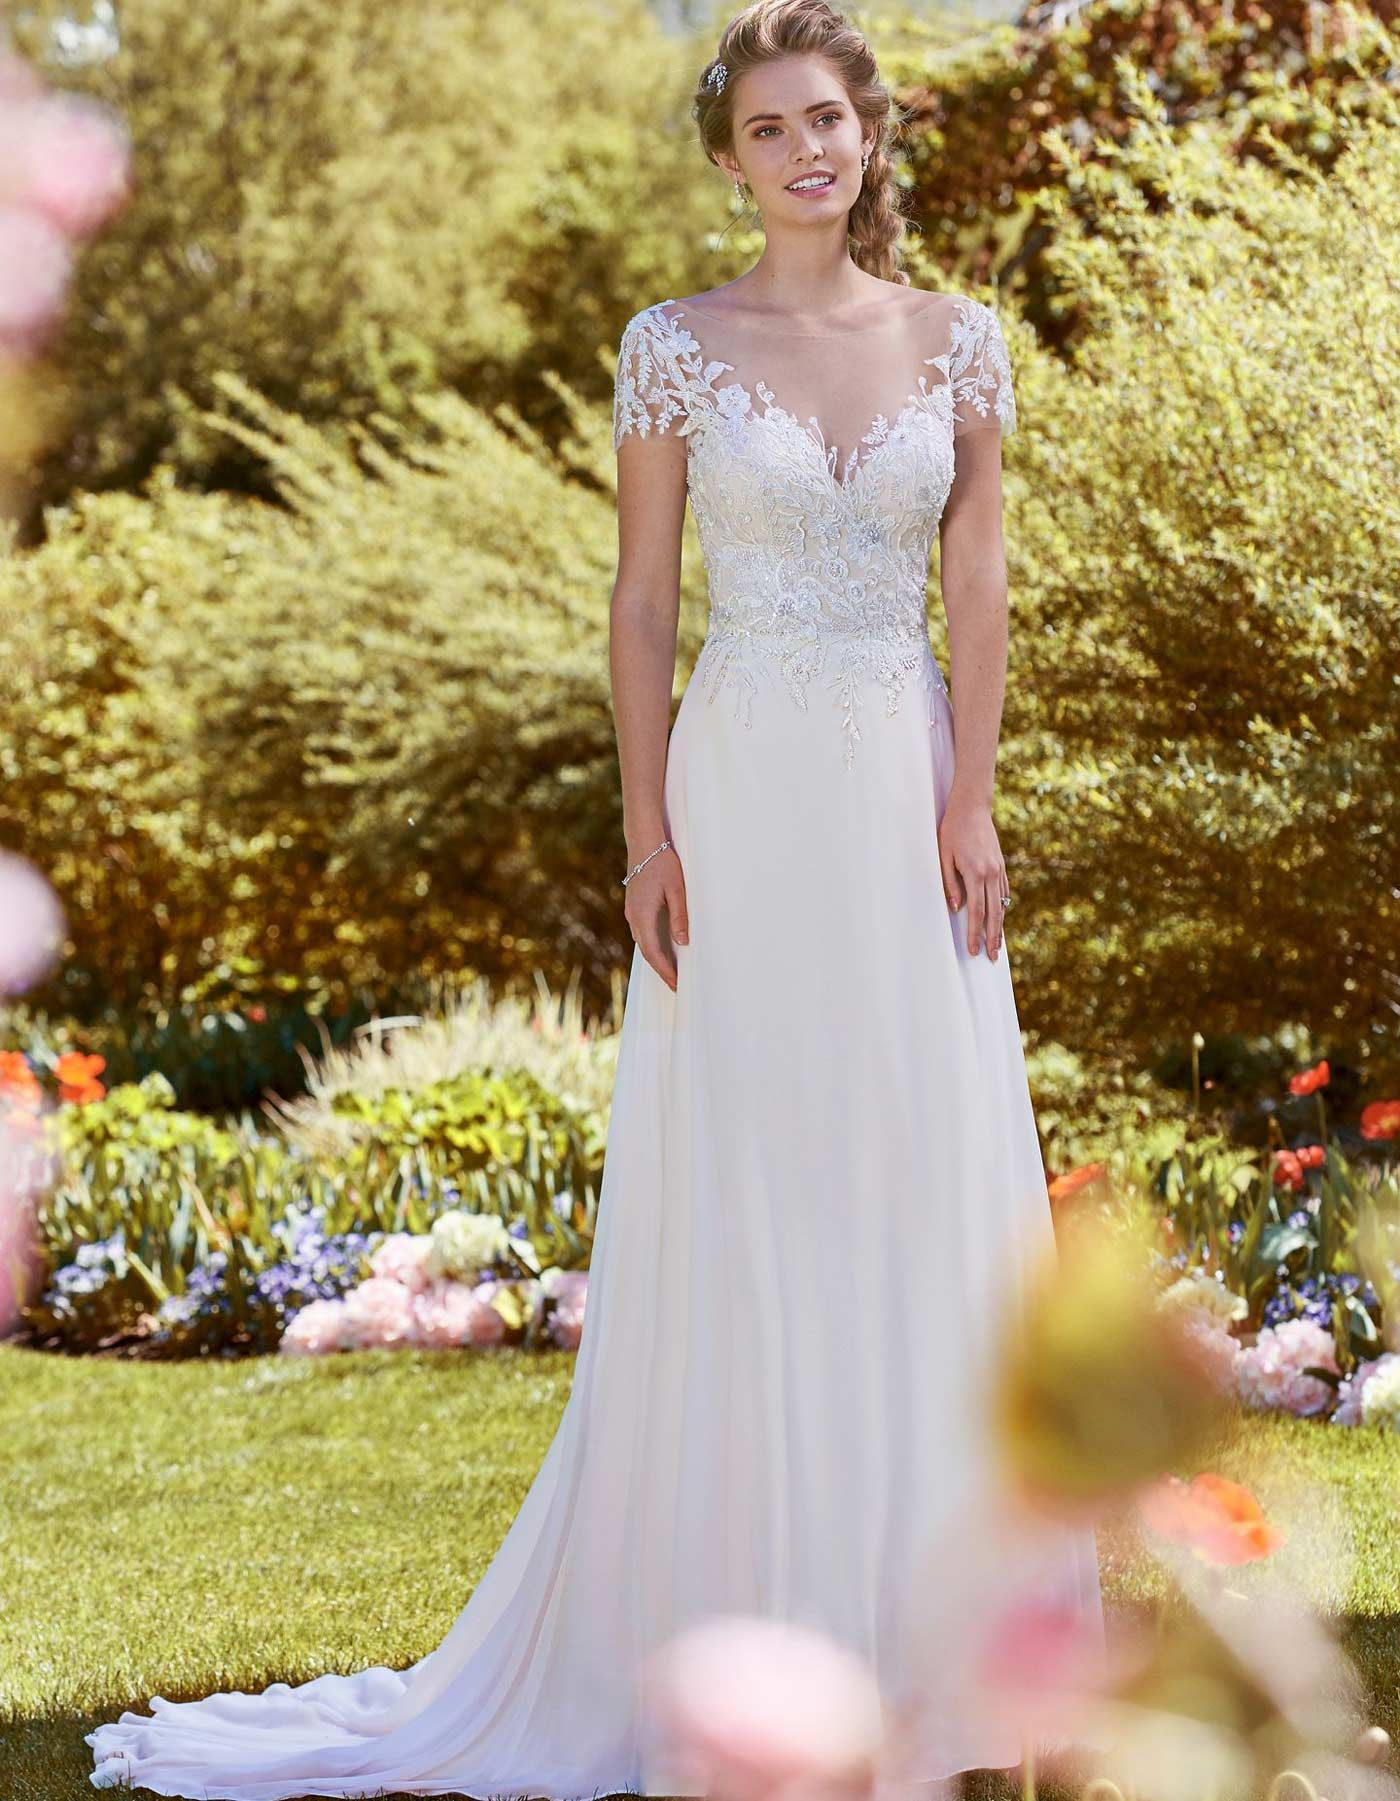 Cece wedding dress  MERCY by REBECCA INGRAM Beaded lace motifs and Swarovski crystals